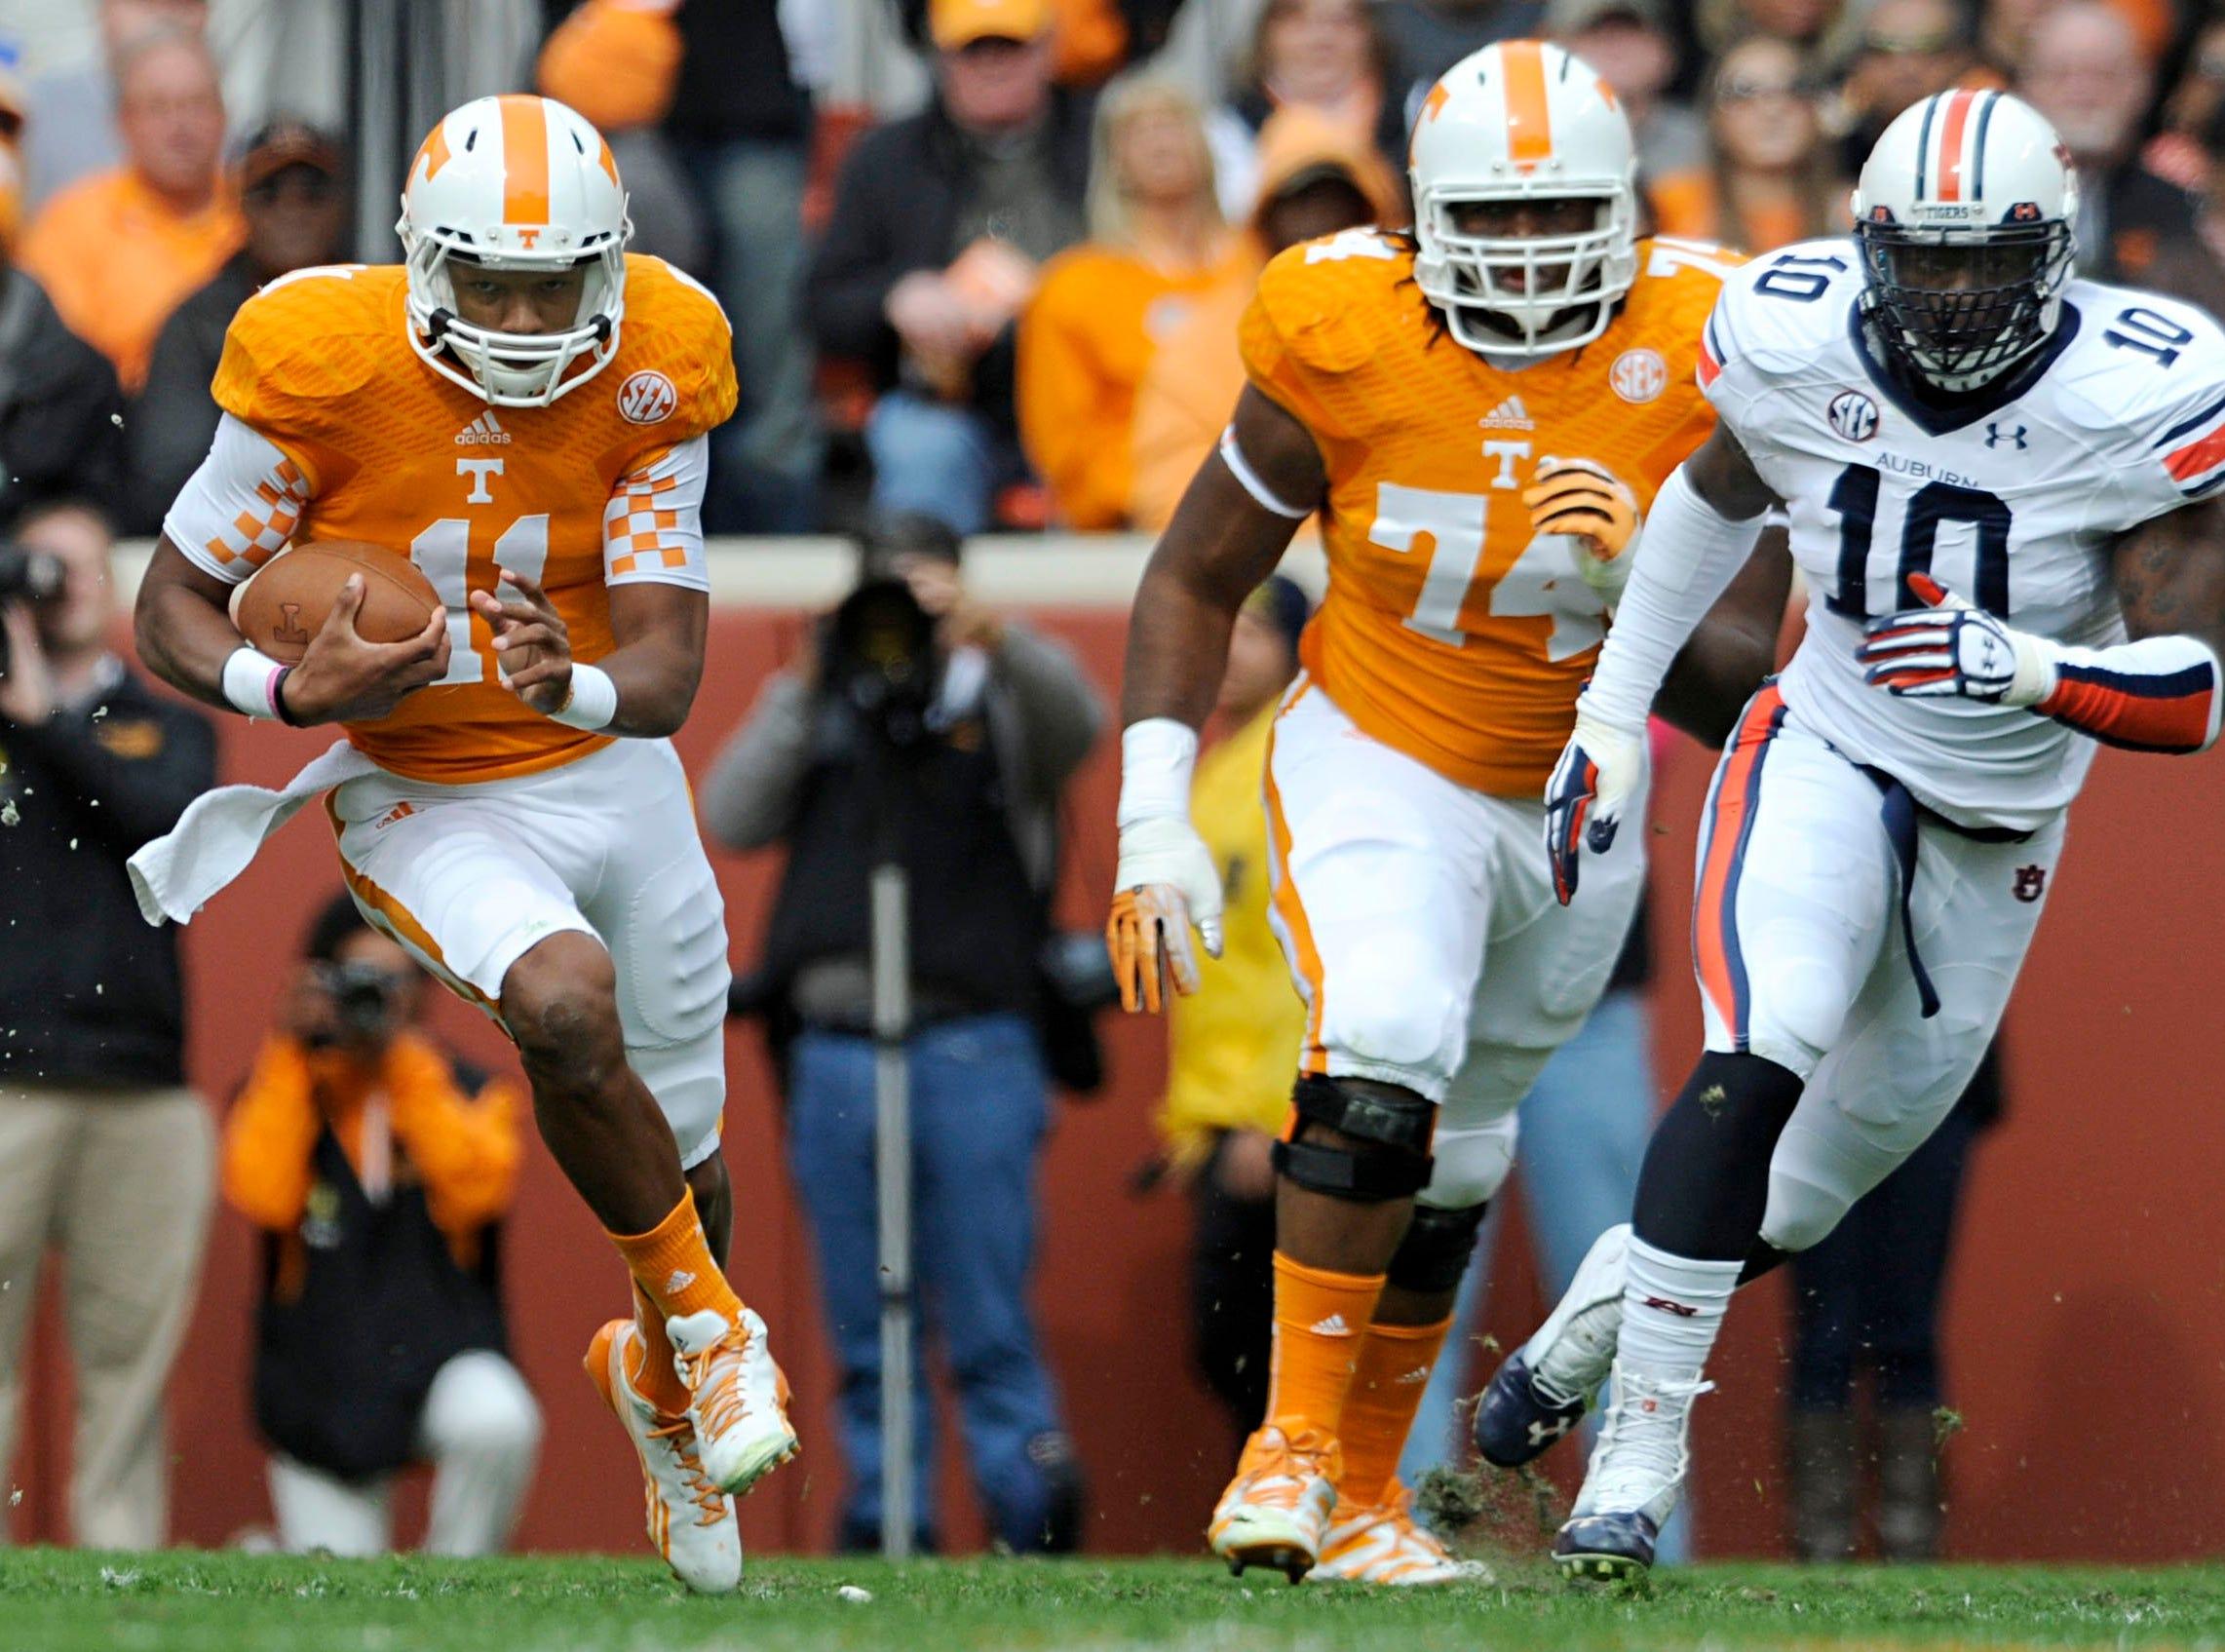 Tennessee quarterback Joshua Dobbs (11) runs downfield past Auburn defensive end LaDarius Owens (10) during the first half at Neyland Stadium in Knoxville on Saturday, Nov. 9, 2013.